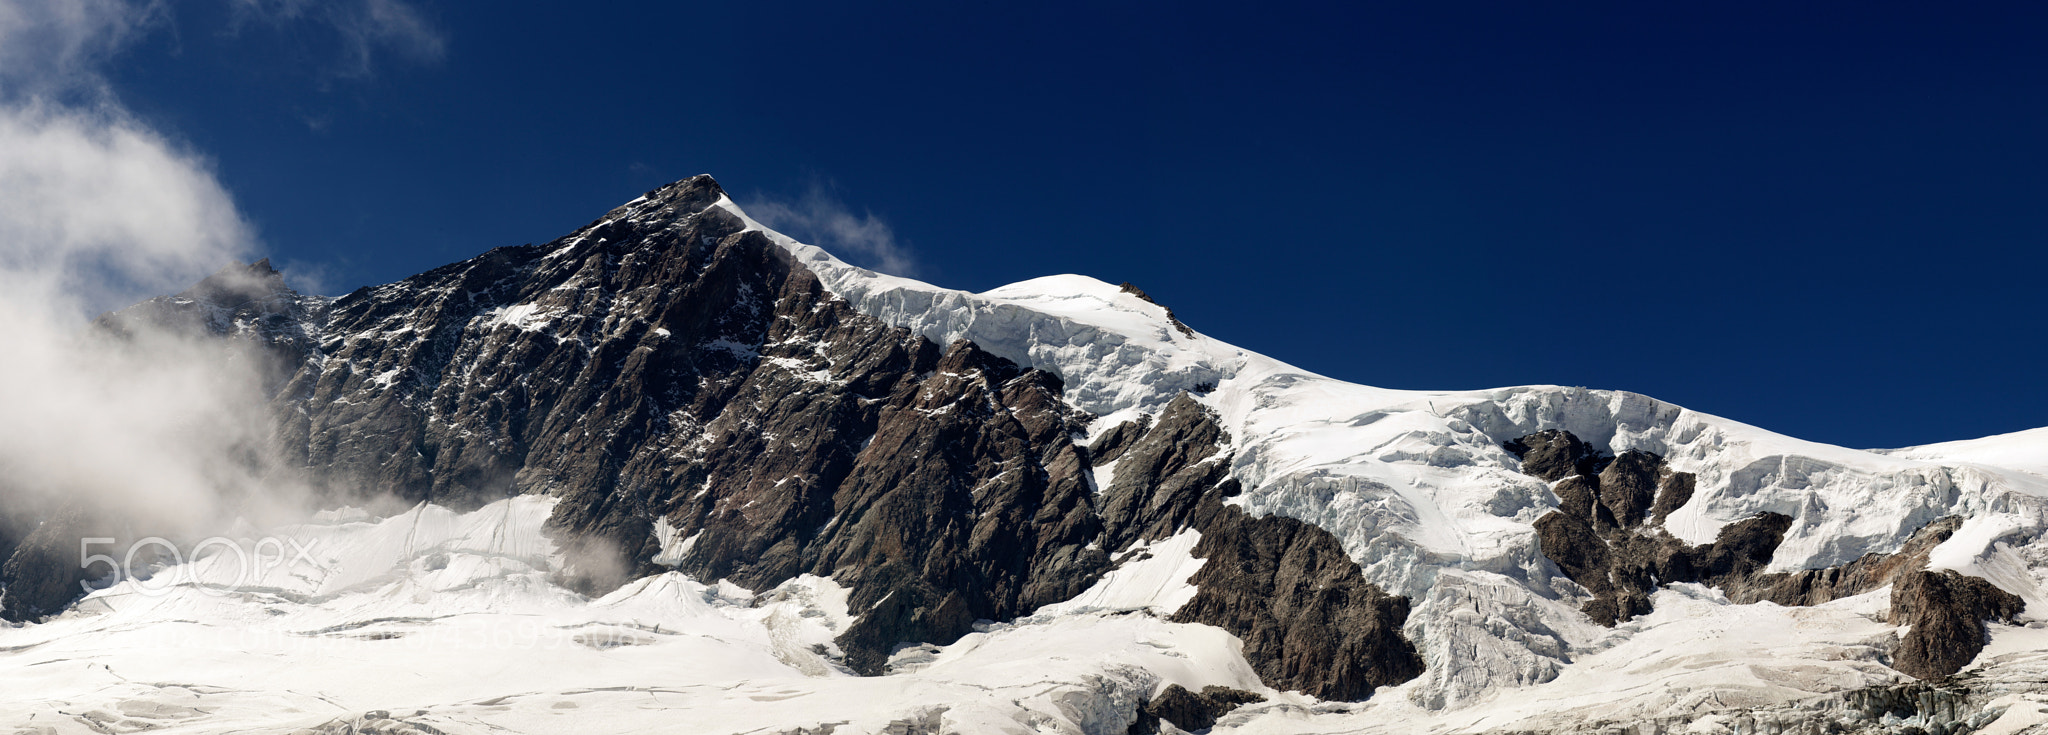 Photograph Aletschorn 4193mt by giorgio debernardi on 500px